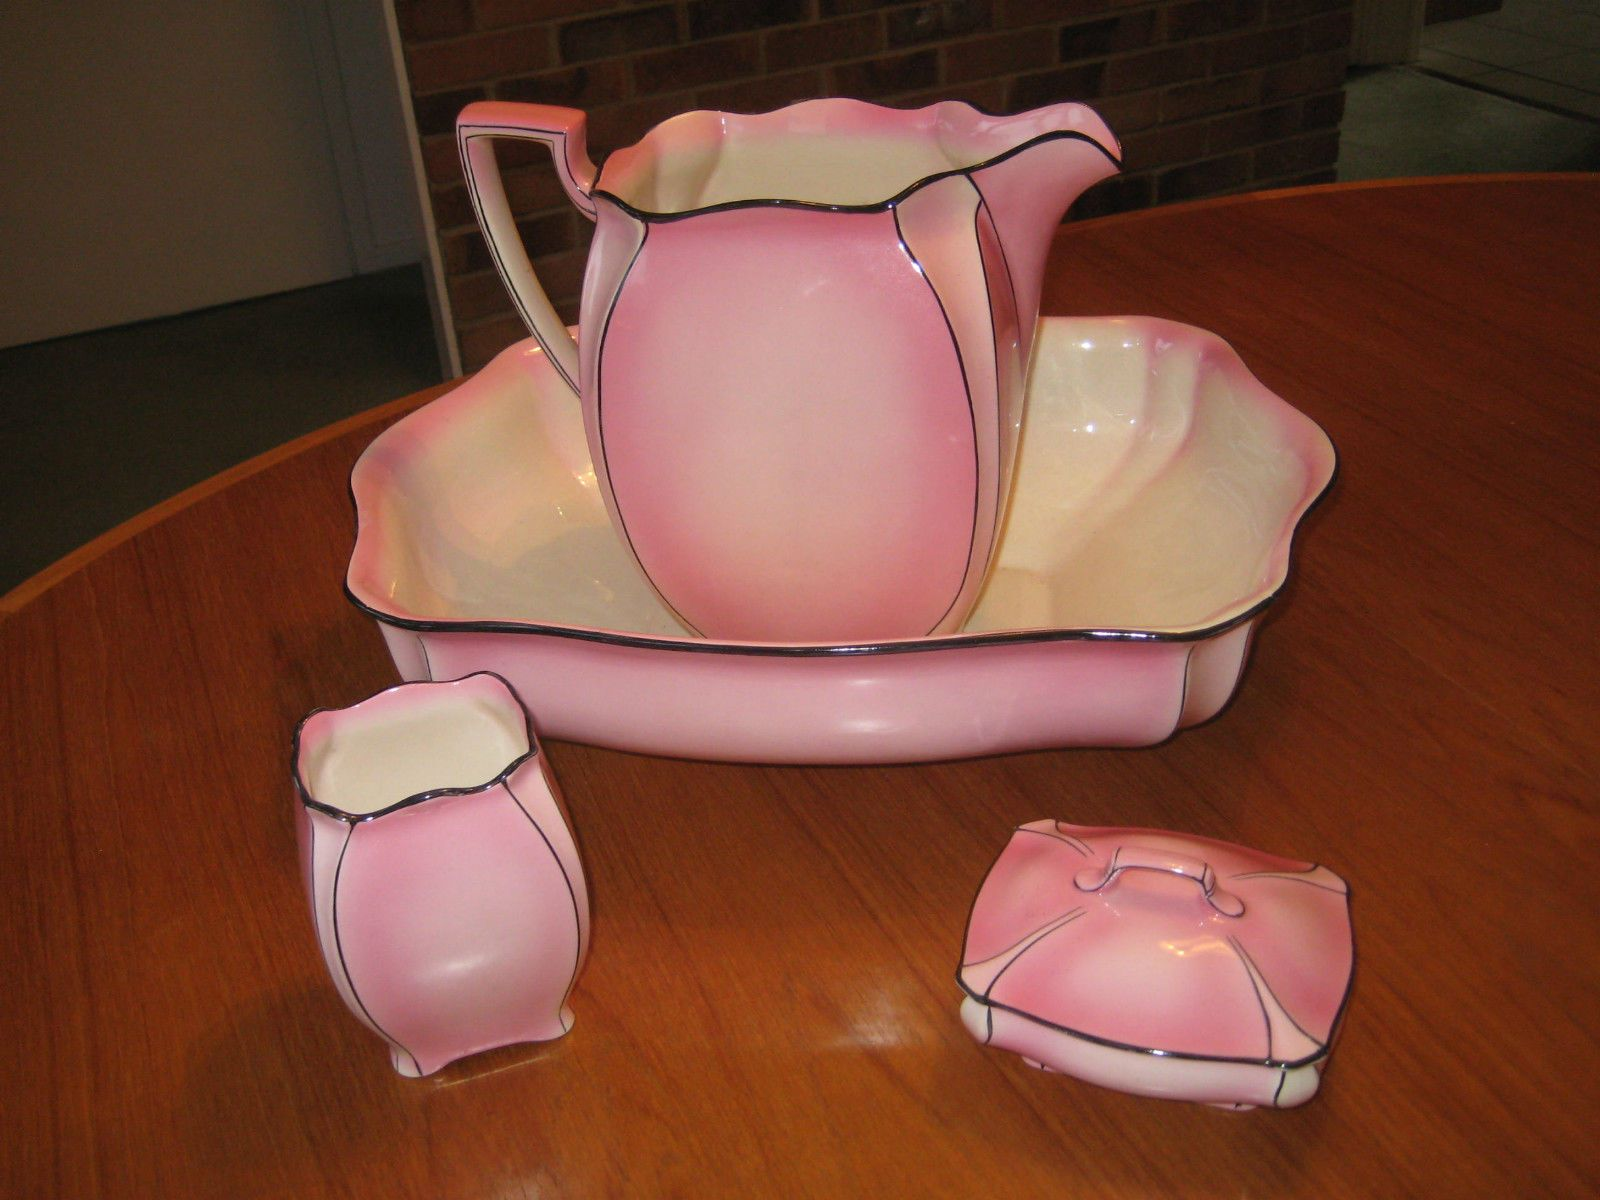 Vintage royal winton grimwades wash stand set jug basin soap vintage royal winton grimwades wash stand set jug basin soap dish vase etc reviewsmspy